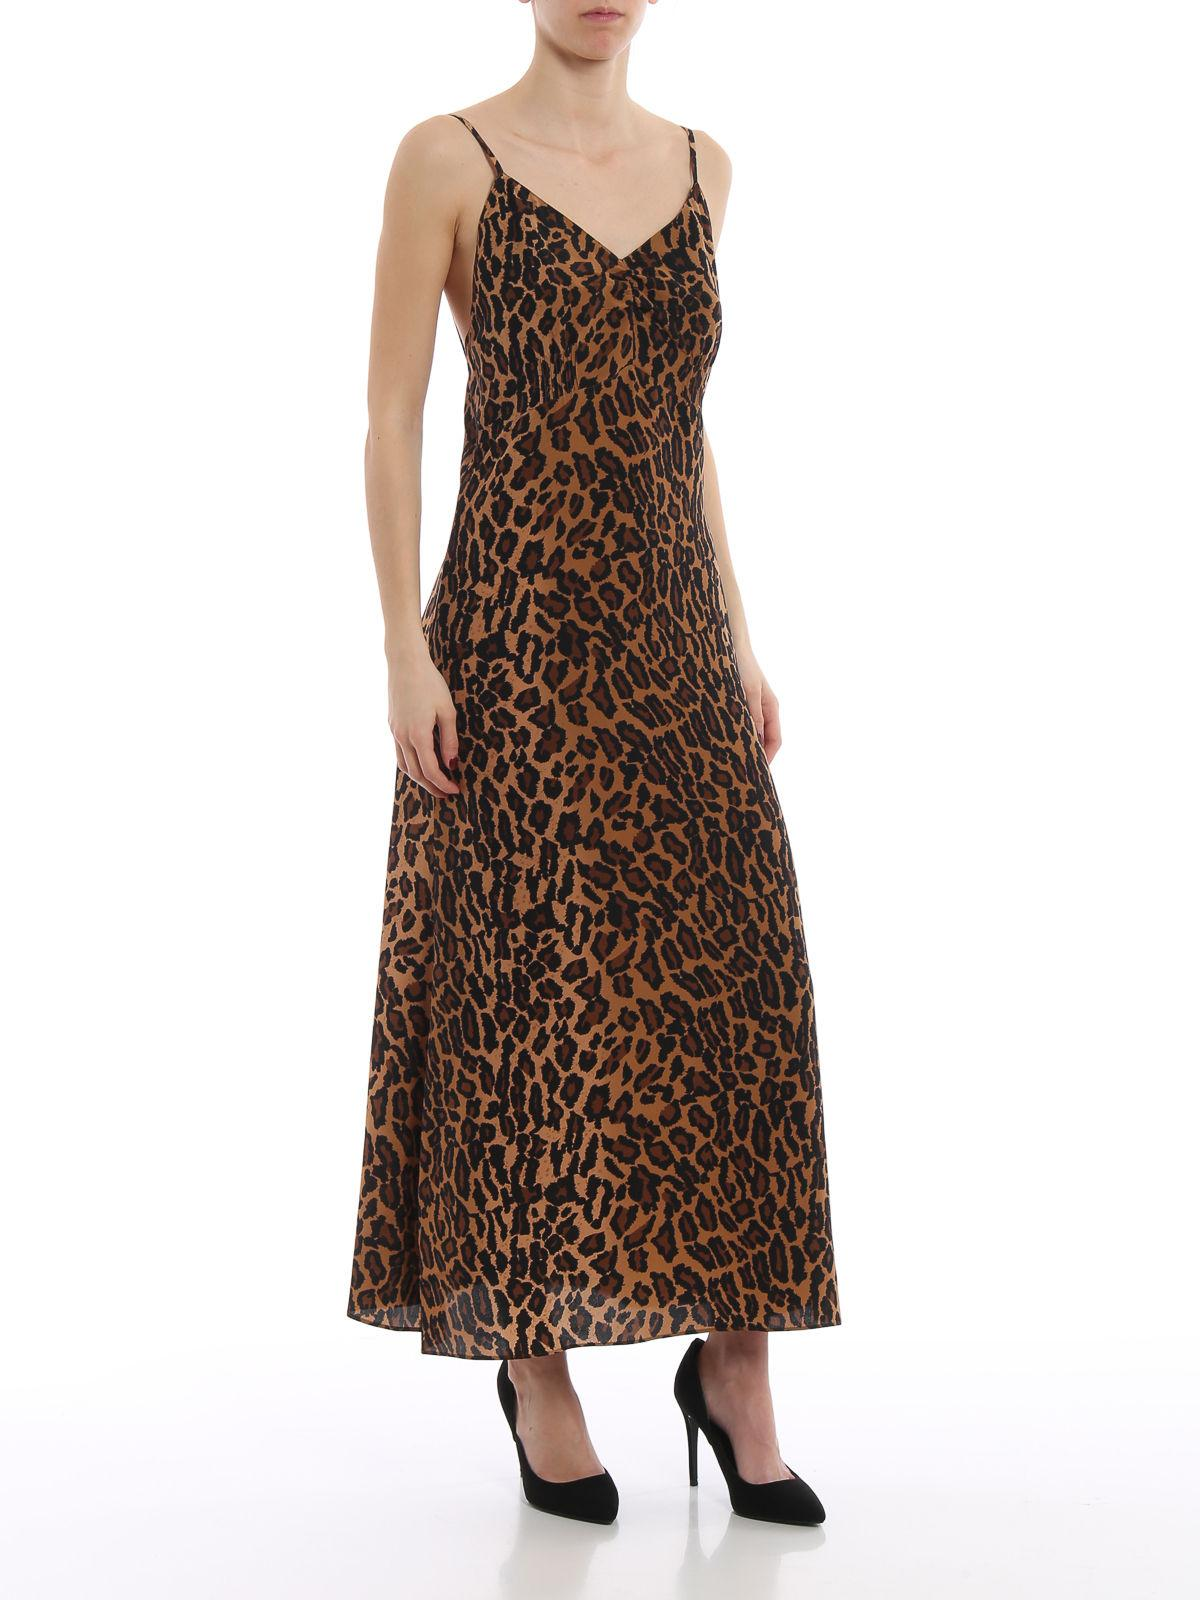 c98c408dd9 Lyst - Miu Miu Leo Printed Silk Slip Dress in Brown - Save  25.768321513002363%